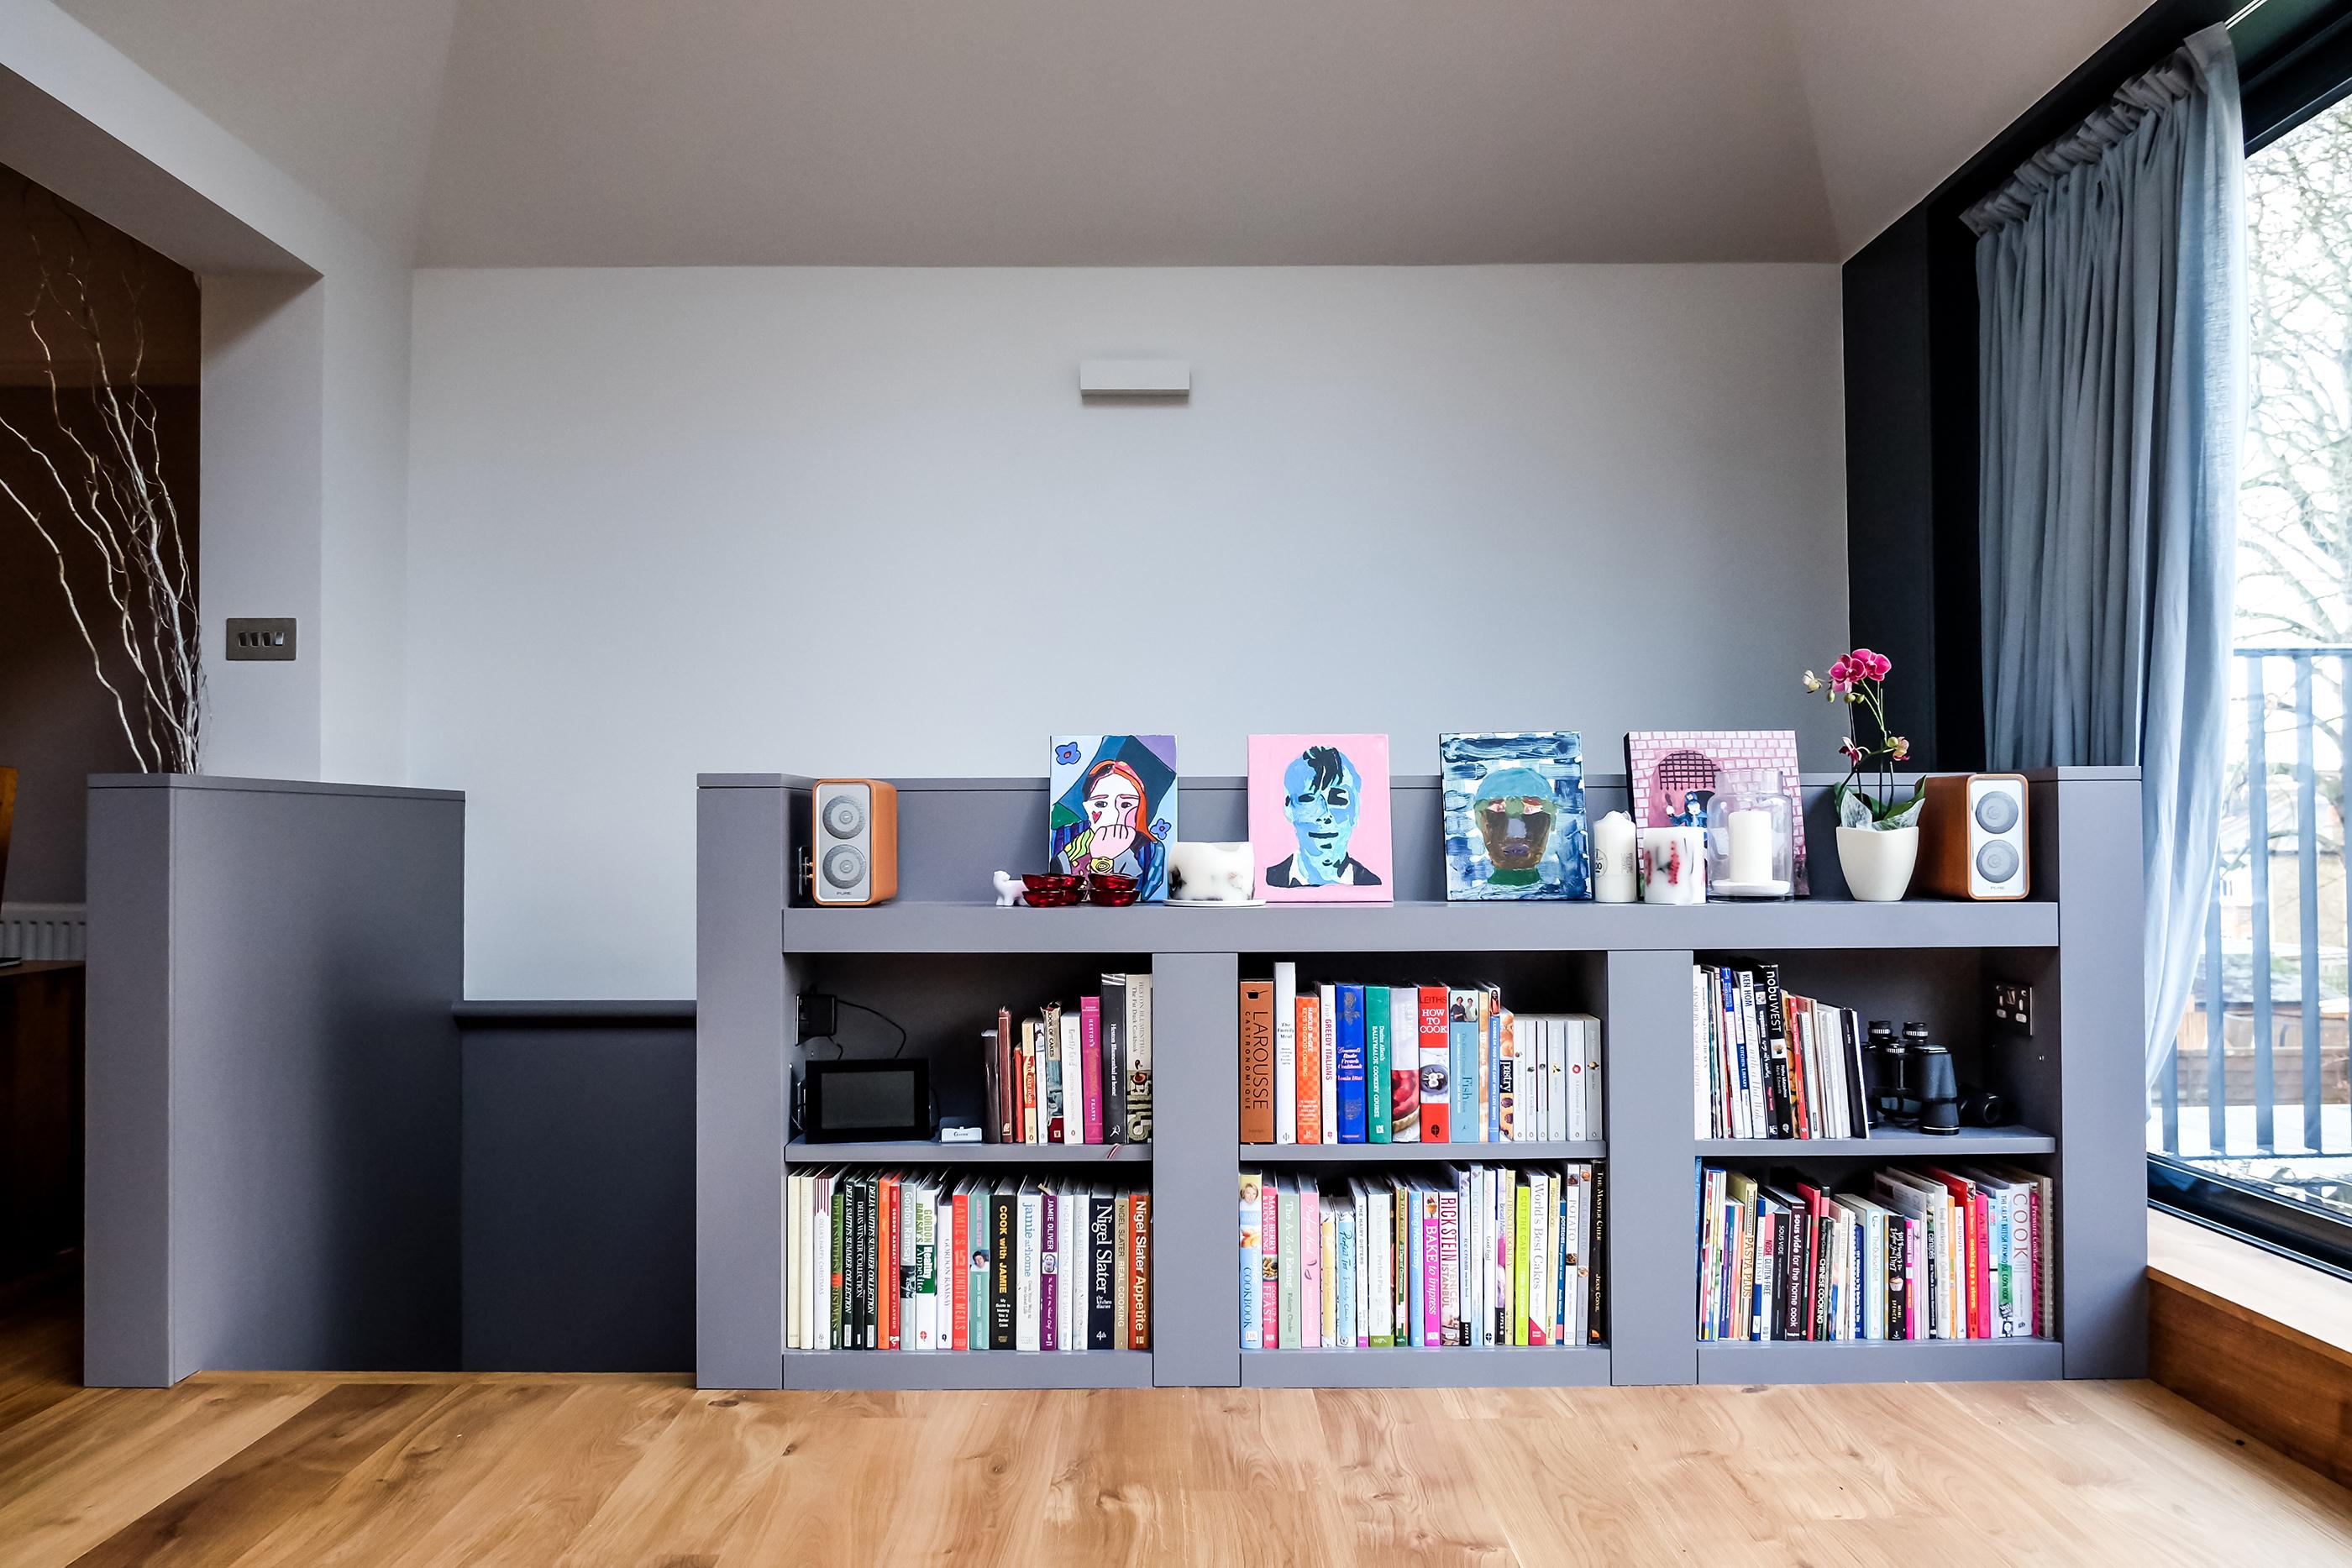 A grey bookshelf